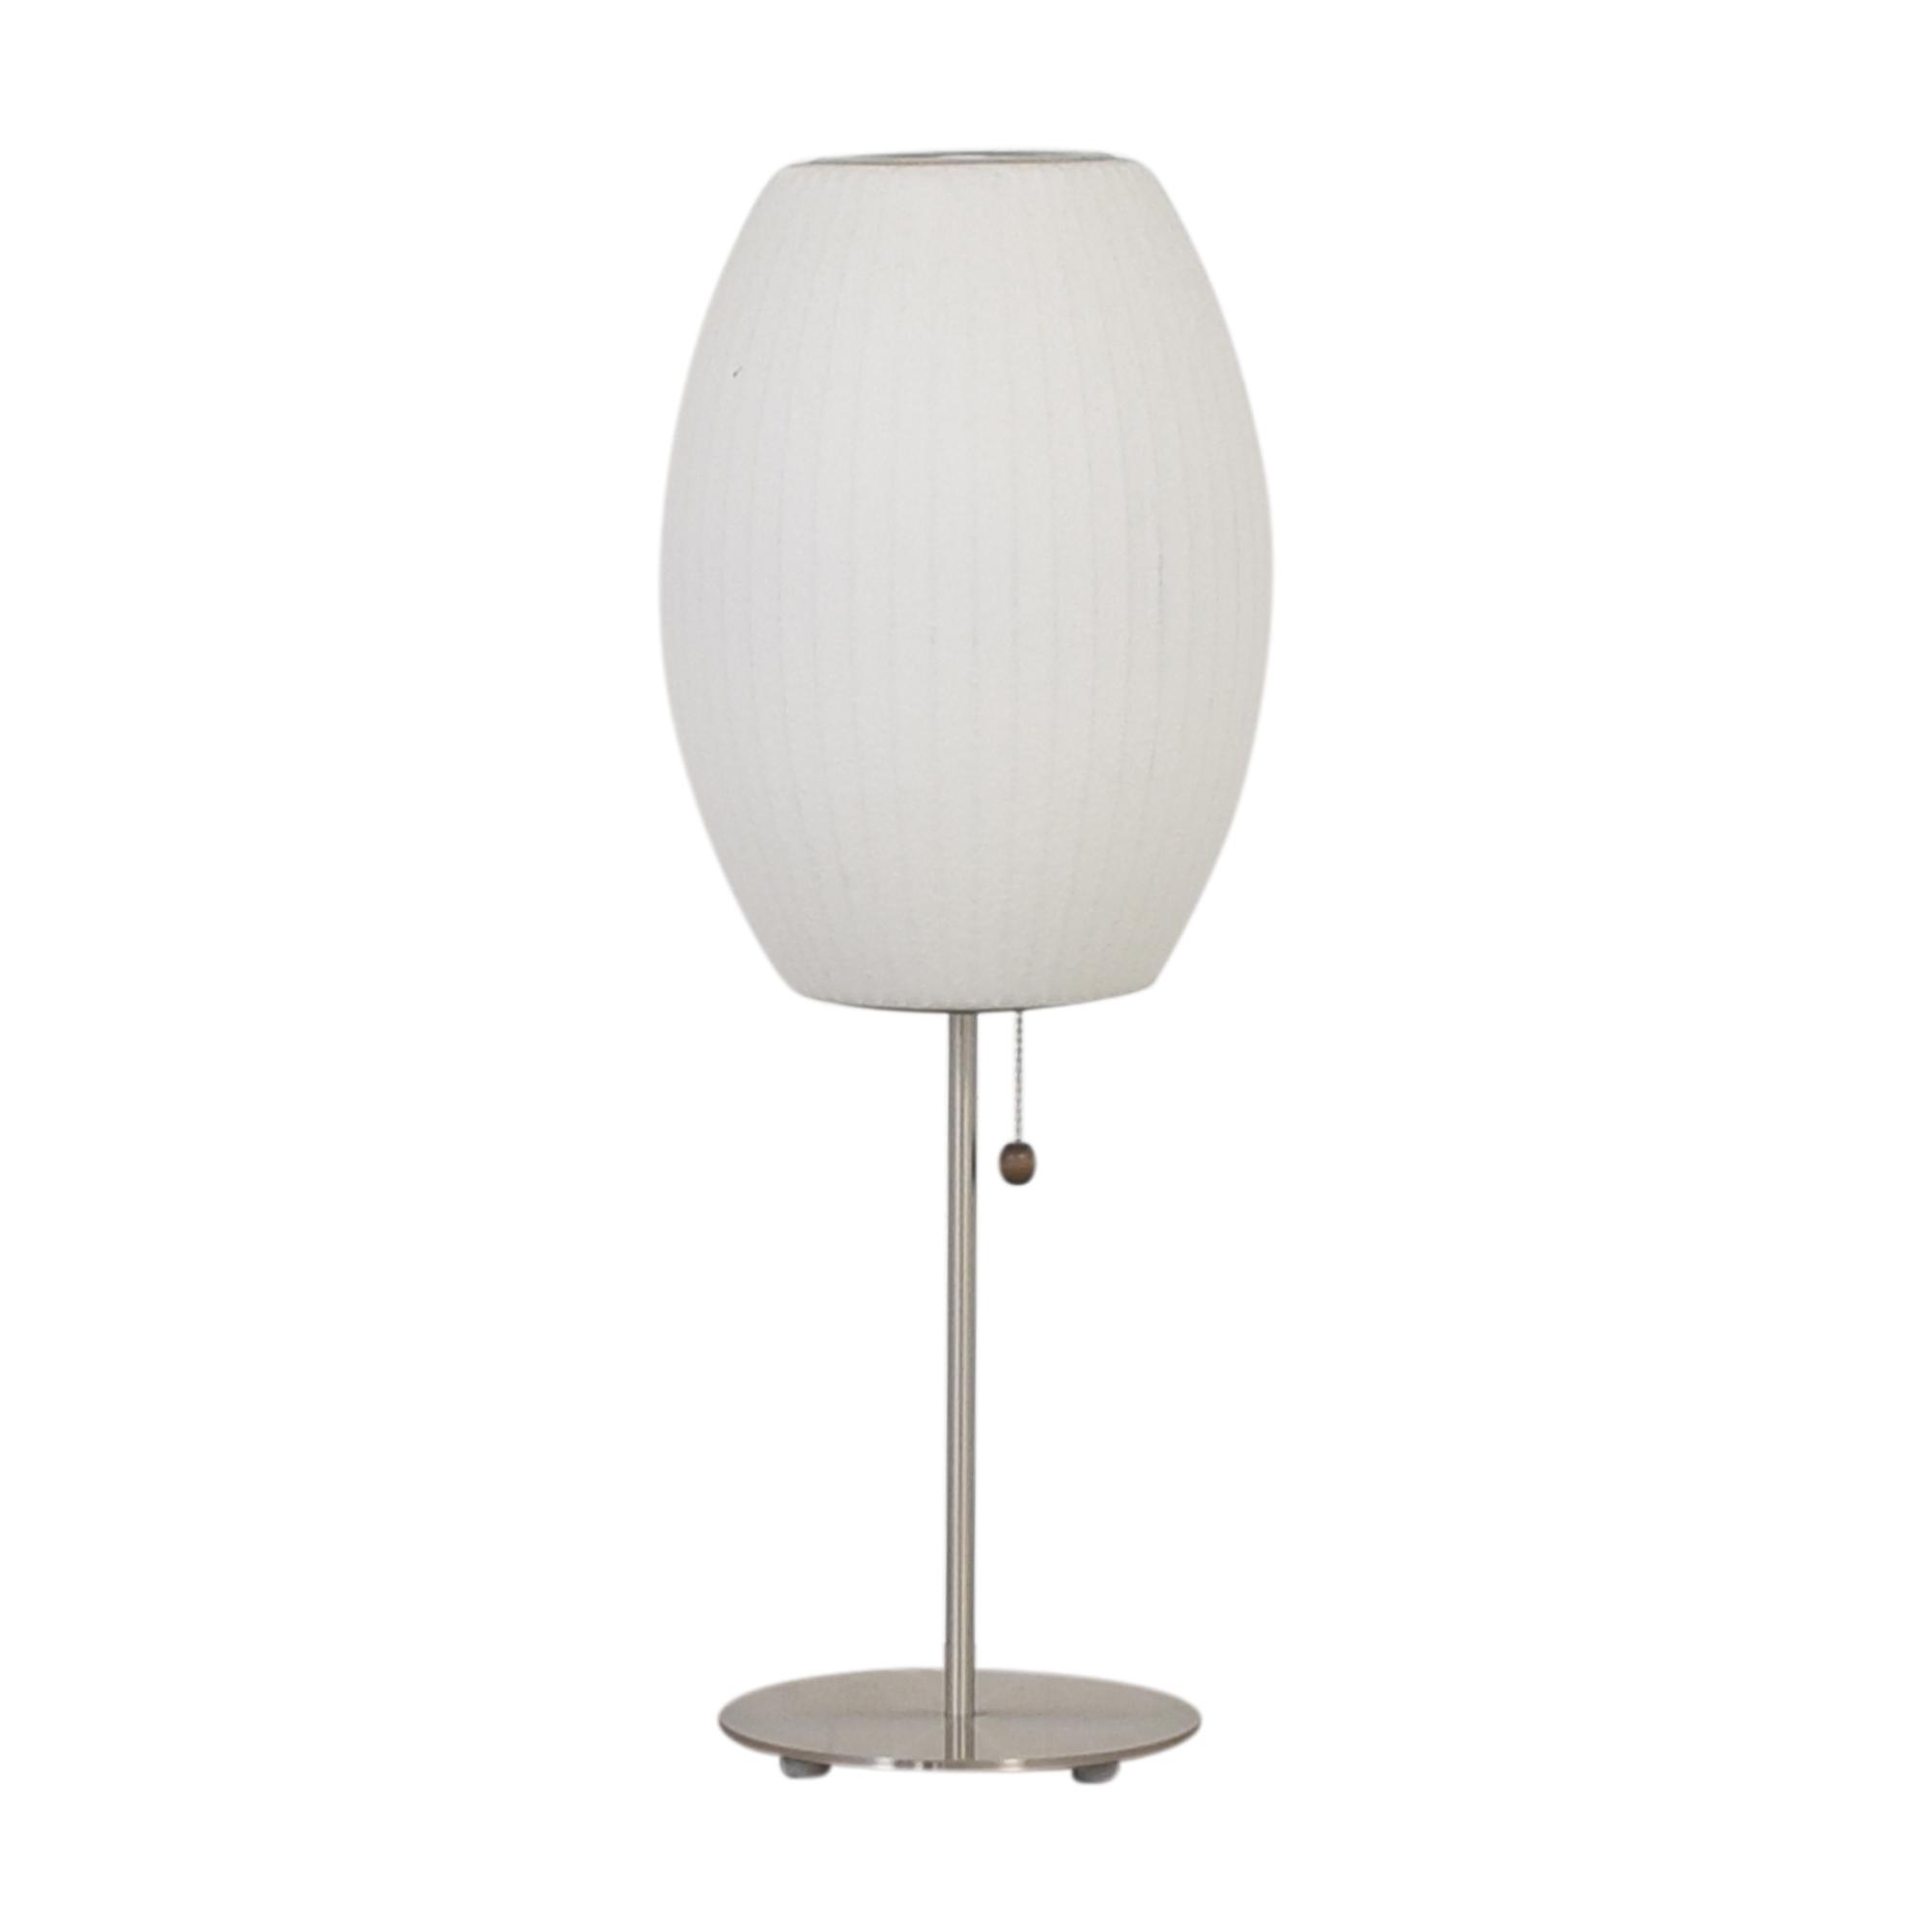 buy Modernica Nelson Bubble Lamps Cigar Lotus Table Lamp Modernica